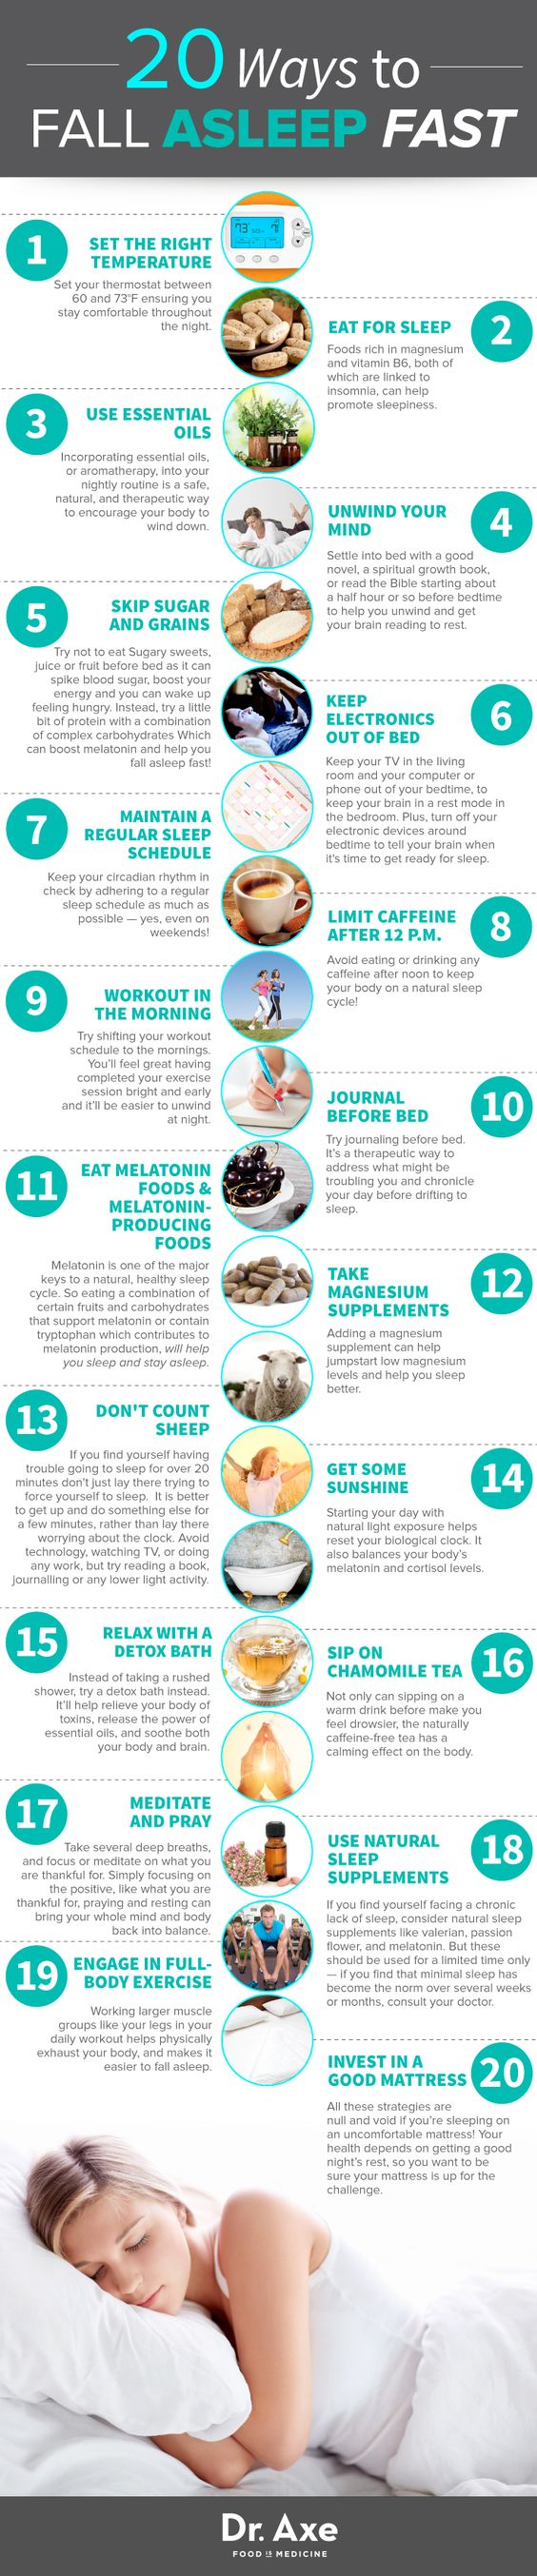 fall a sleep fast infographic